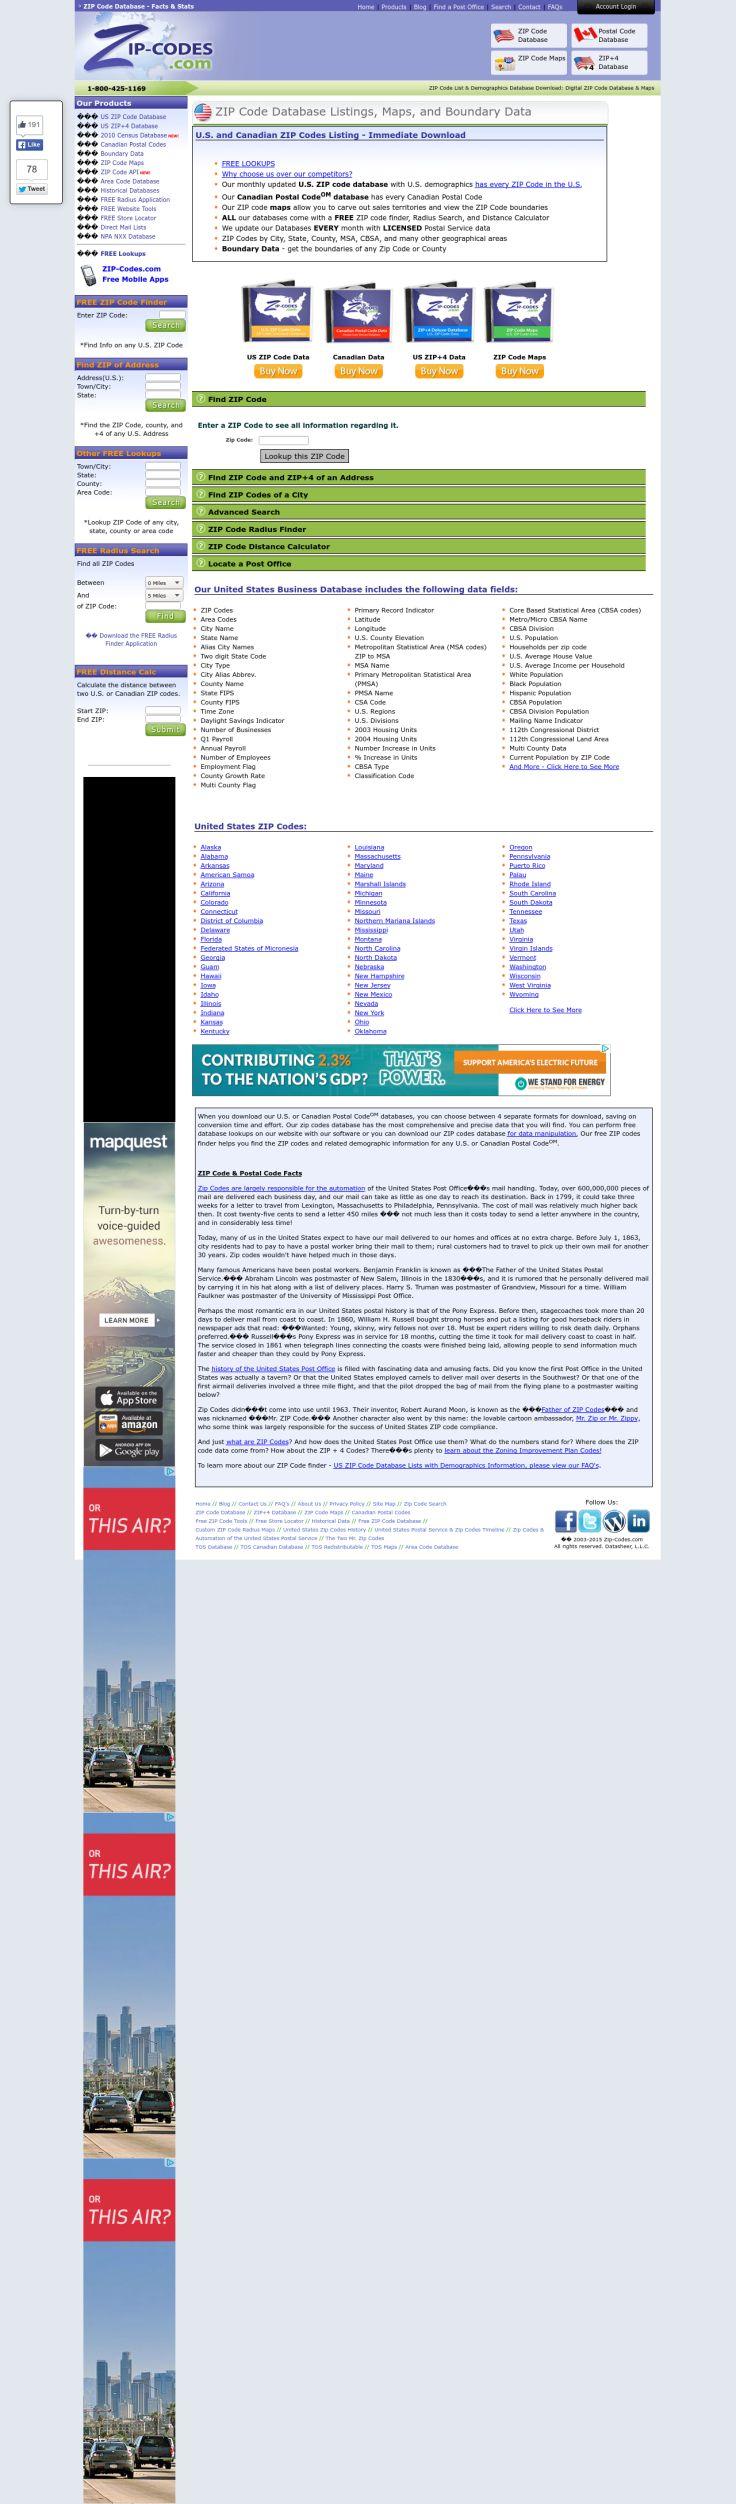 Best Of Diagram Postal Code Lookup Canada Download More Maps - Us zip code alphanumeric